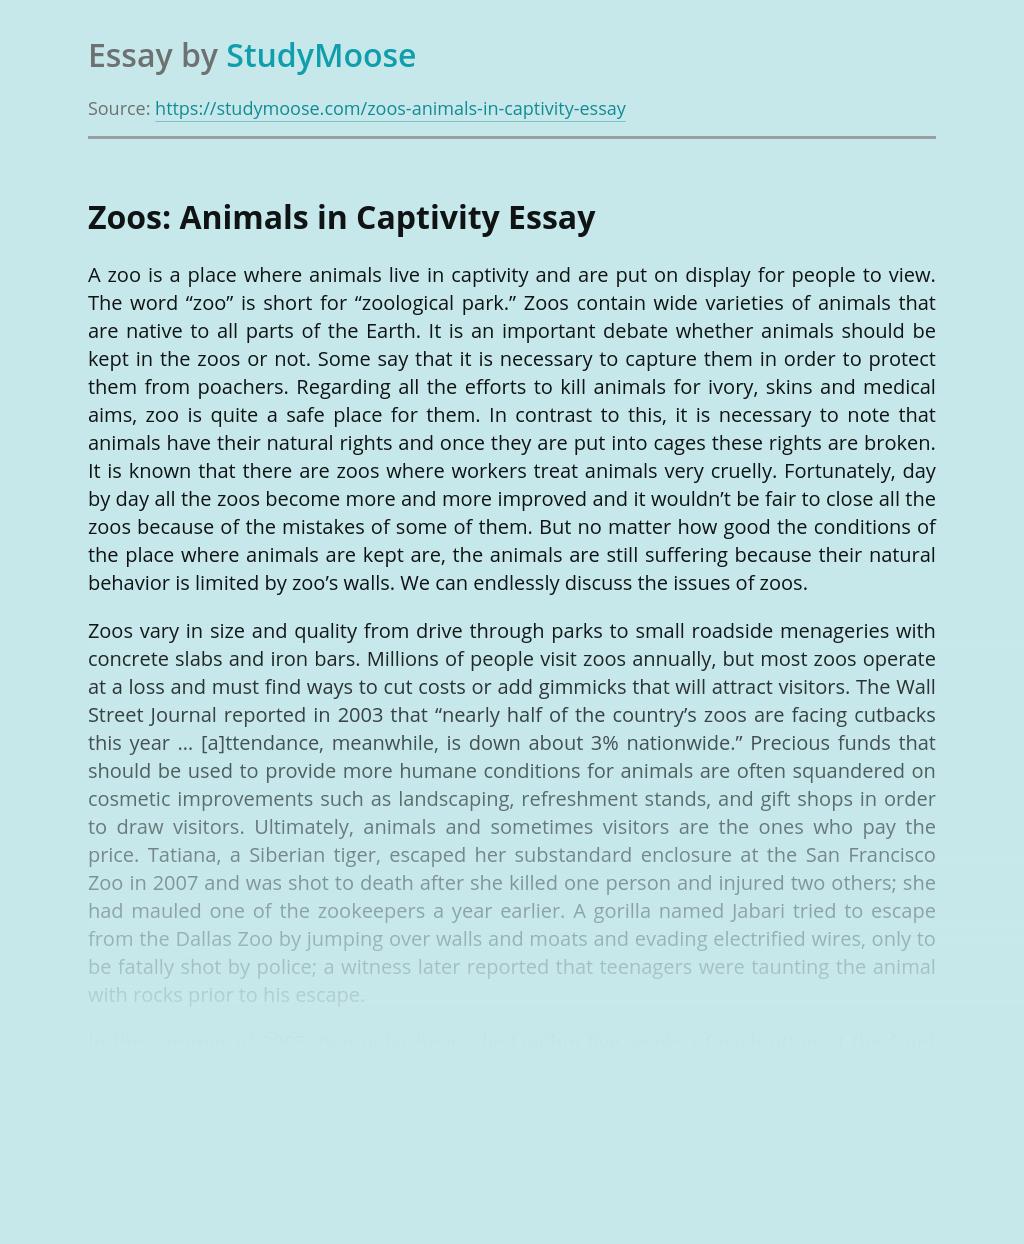 Zoos: Animals in Captivity